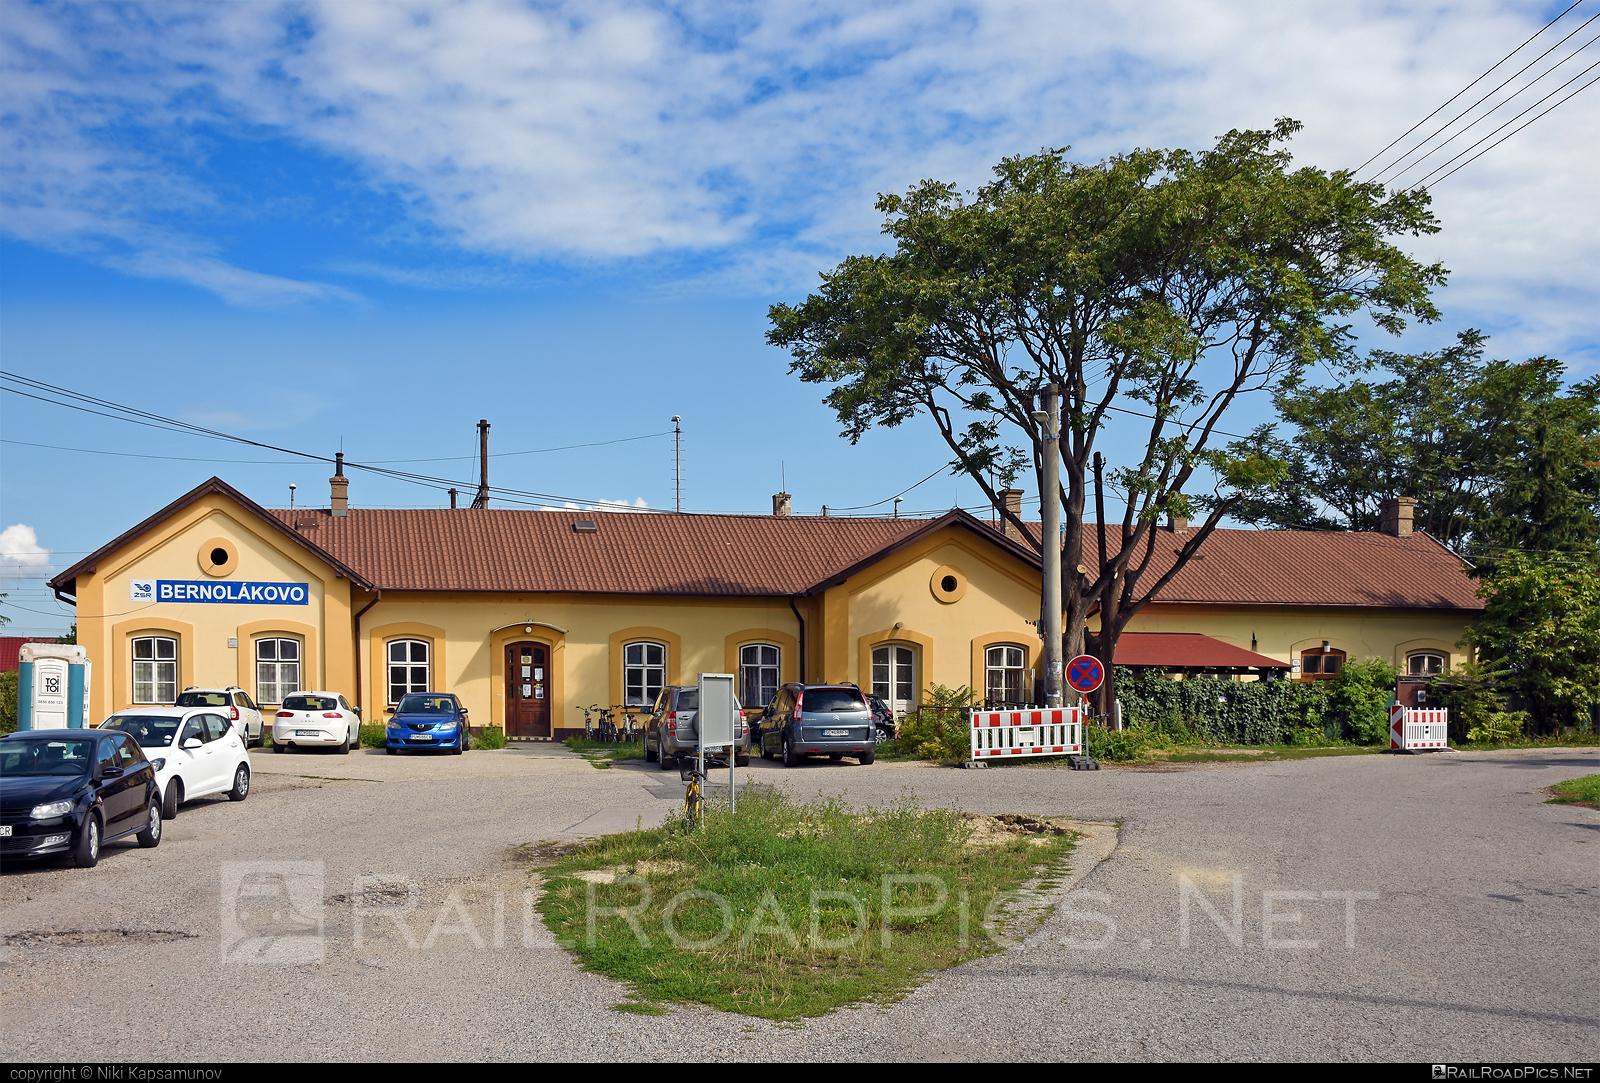 Bernolákovo location overview #bernolakovo #railwaystation #stanica #station #zsr